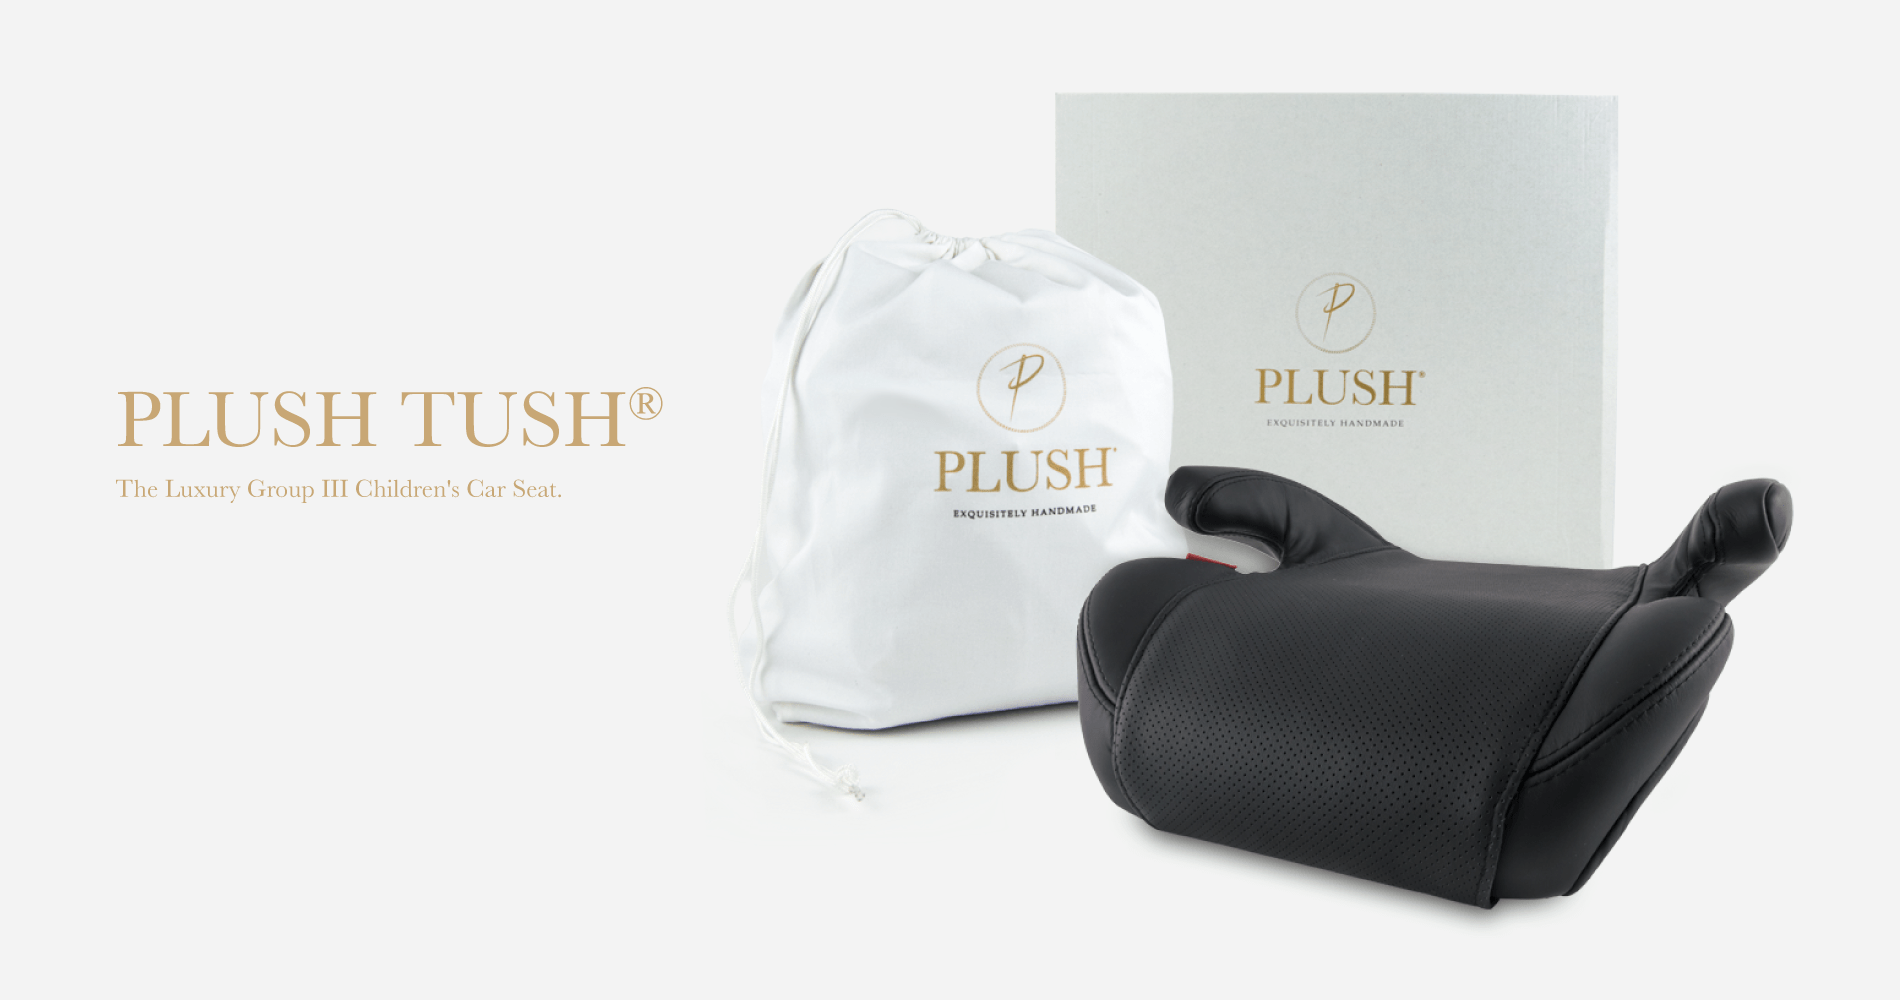 Plush Tush